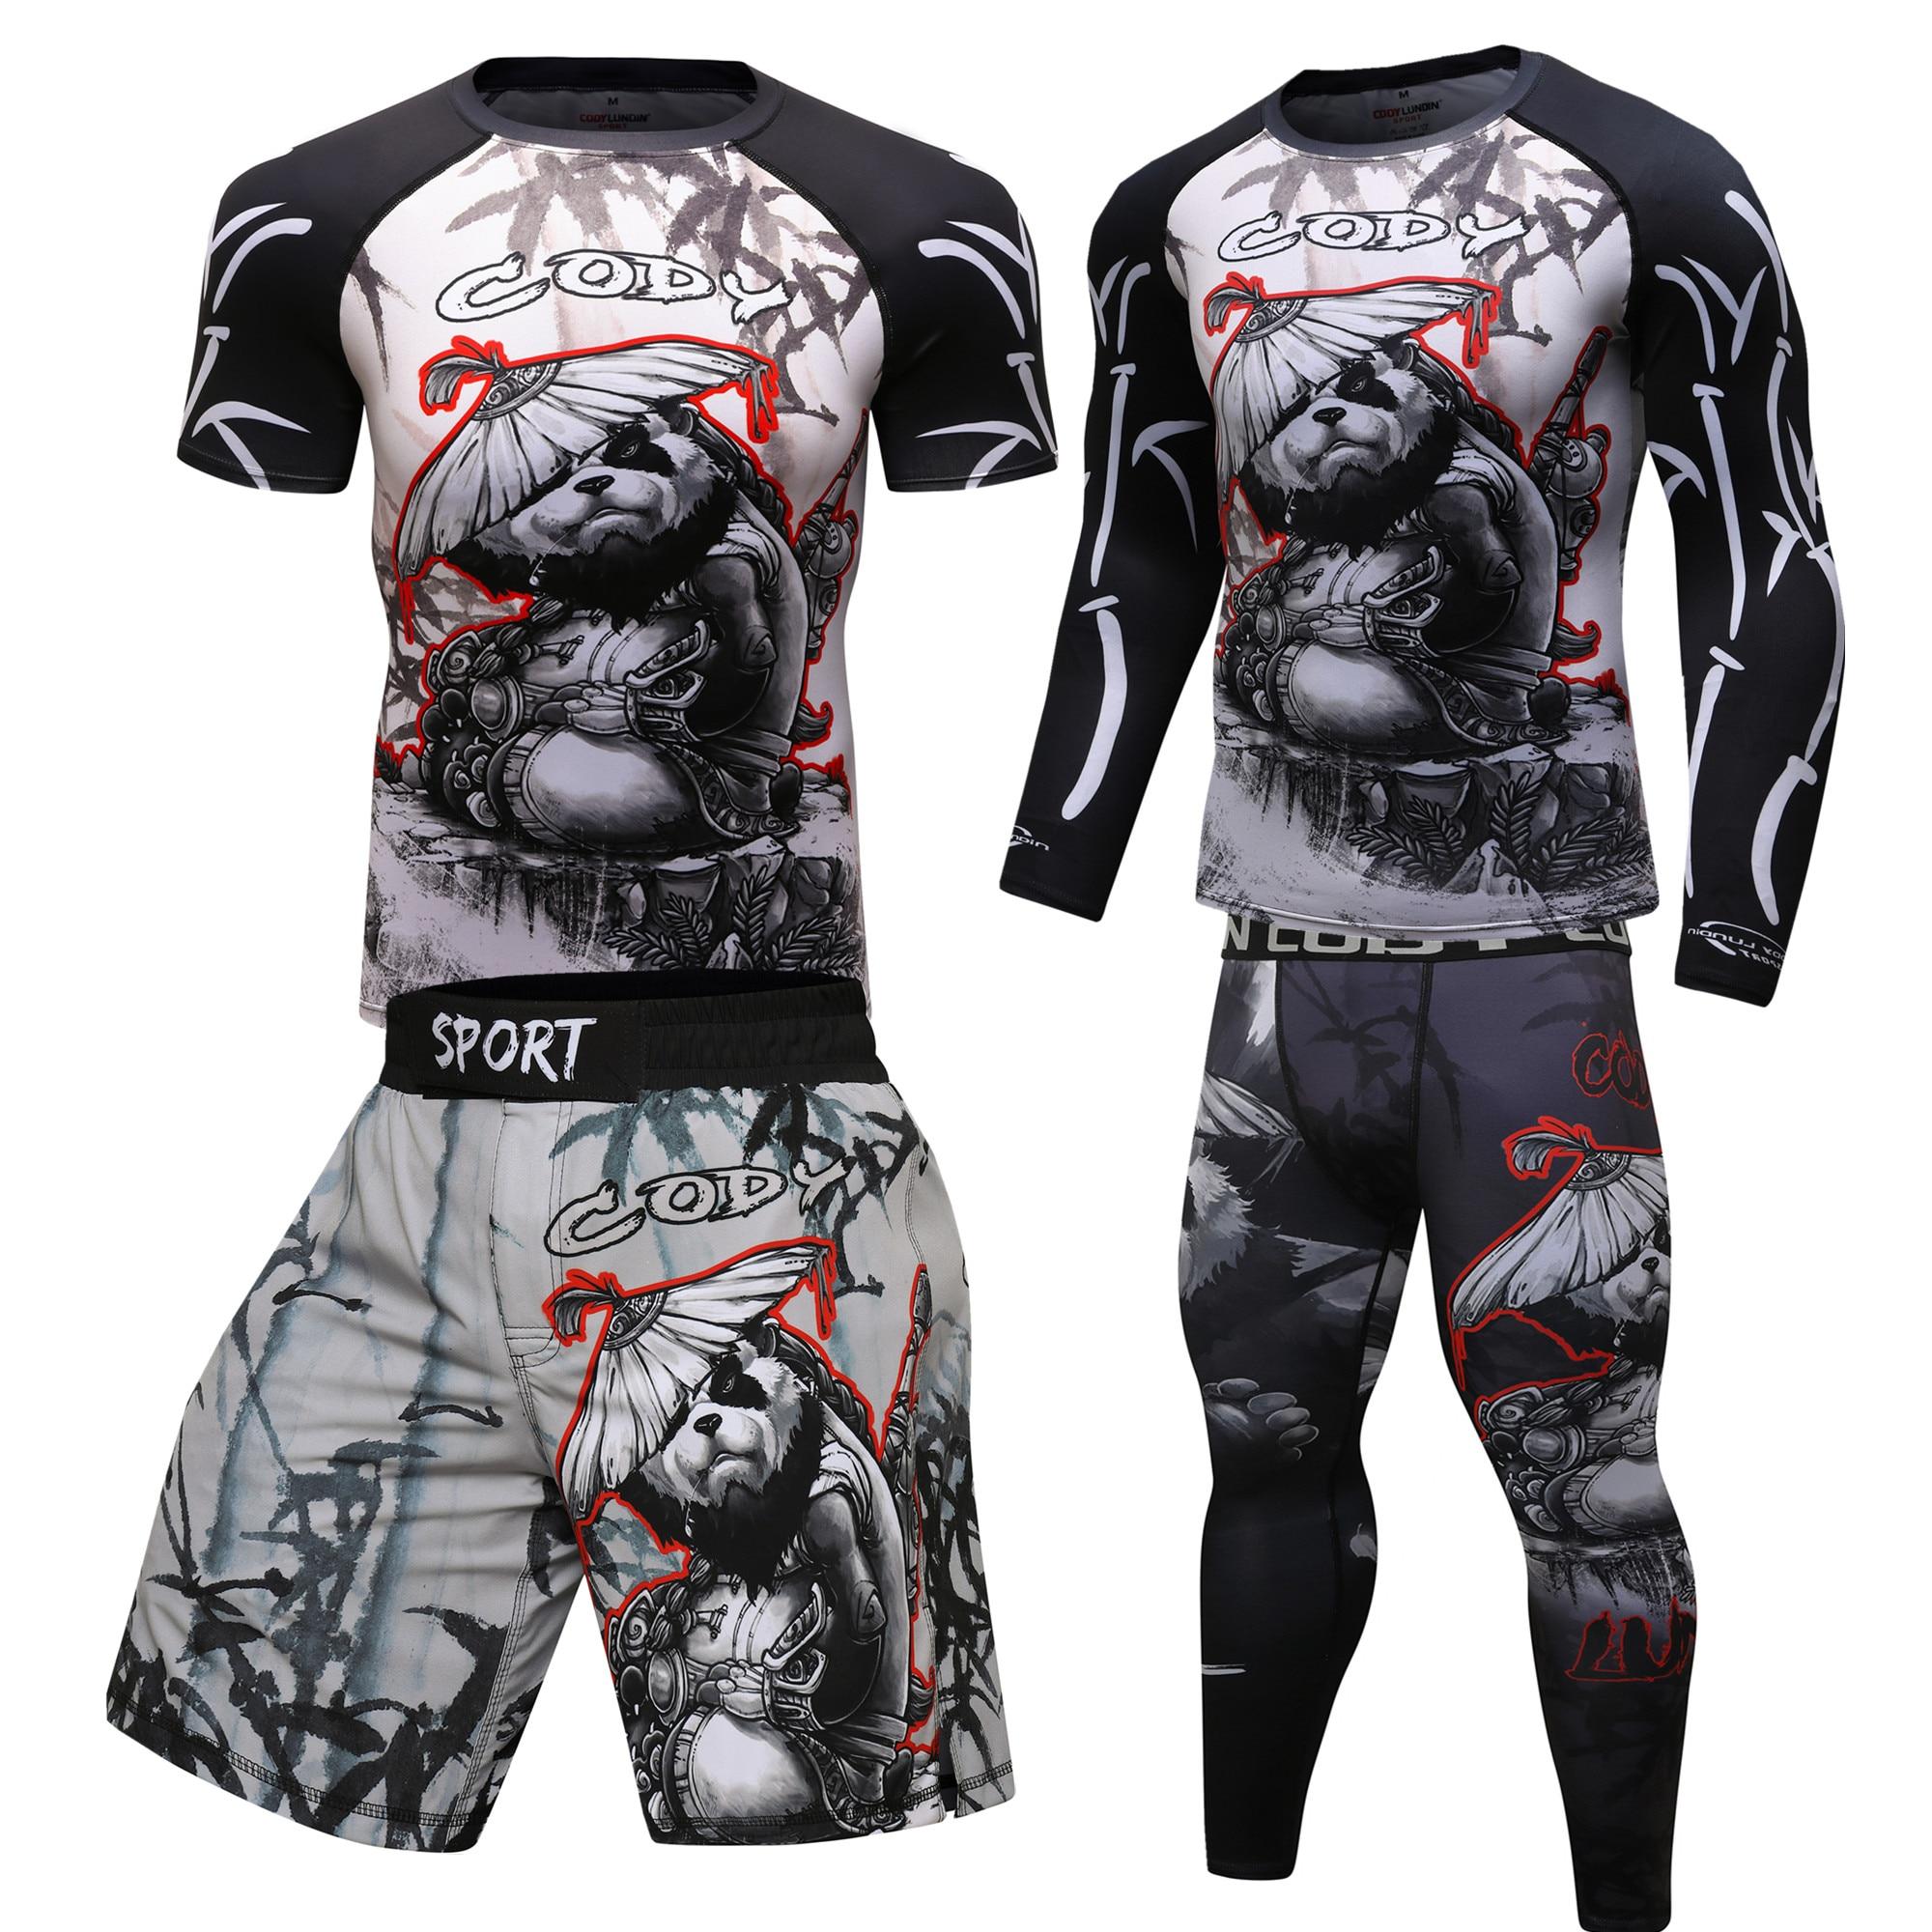 Boxing T-shirts + Hosen Men MMA Shorts Rashguard Mma Boxing Tricks Anzüge Muay Thai Jiu Jitsu Bjj T-shirt BoxeoGym Training Gear